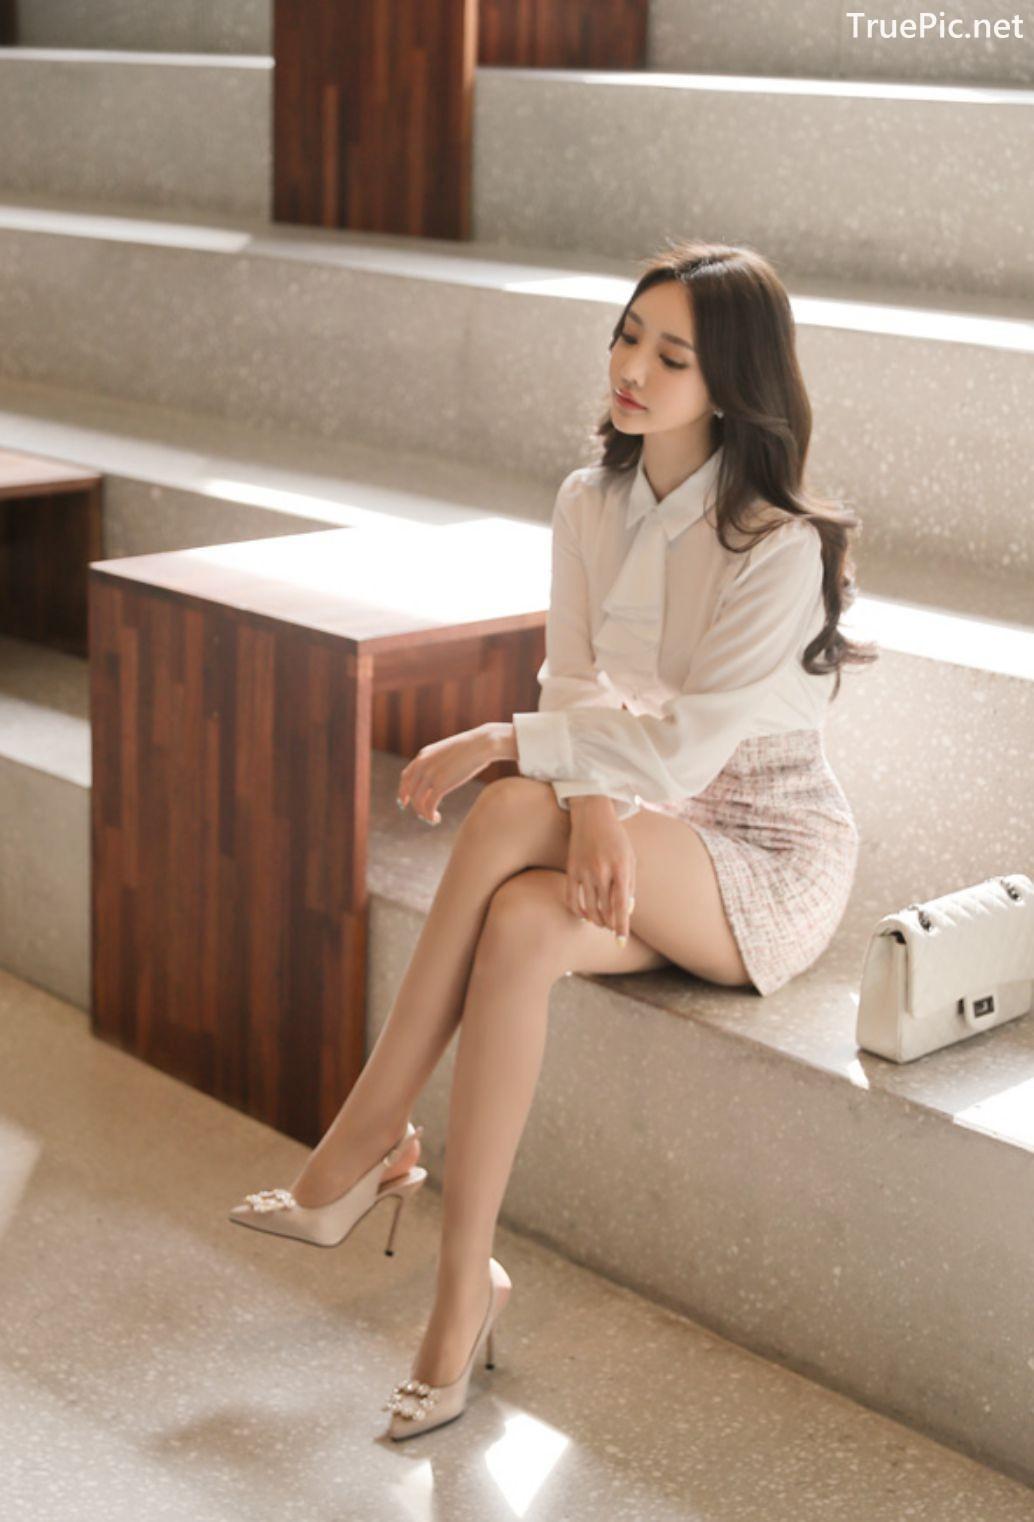 Image-Hot-Korean-Fashion-Model-Son-Yoon-Joo-She-So-Lovely-With-Miniskirt-TruePic.net- Picture-5